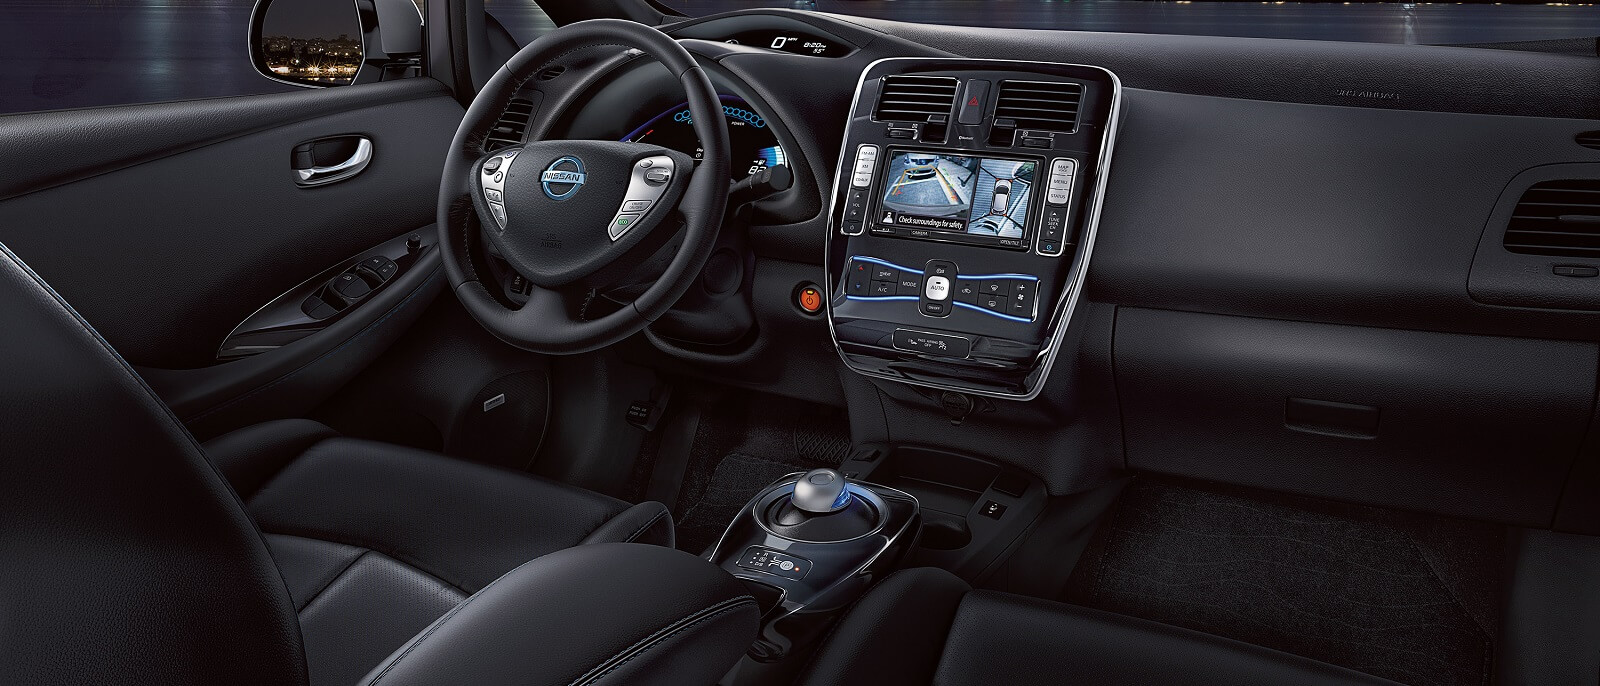 2016-nissan-leaf-interior